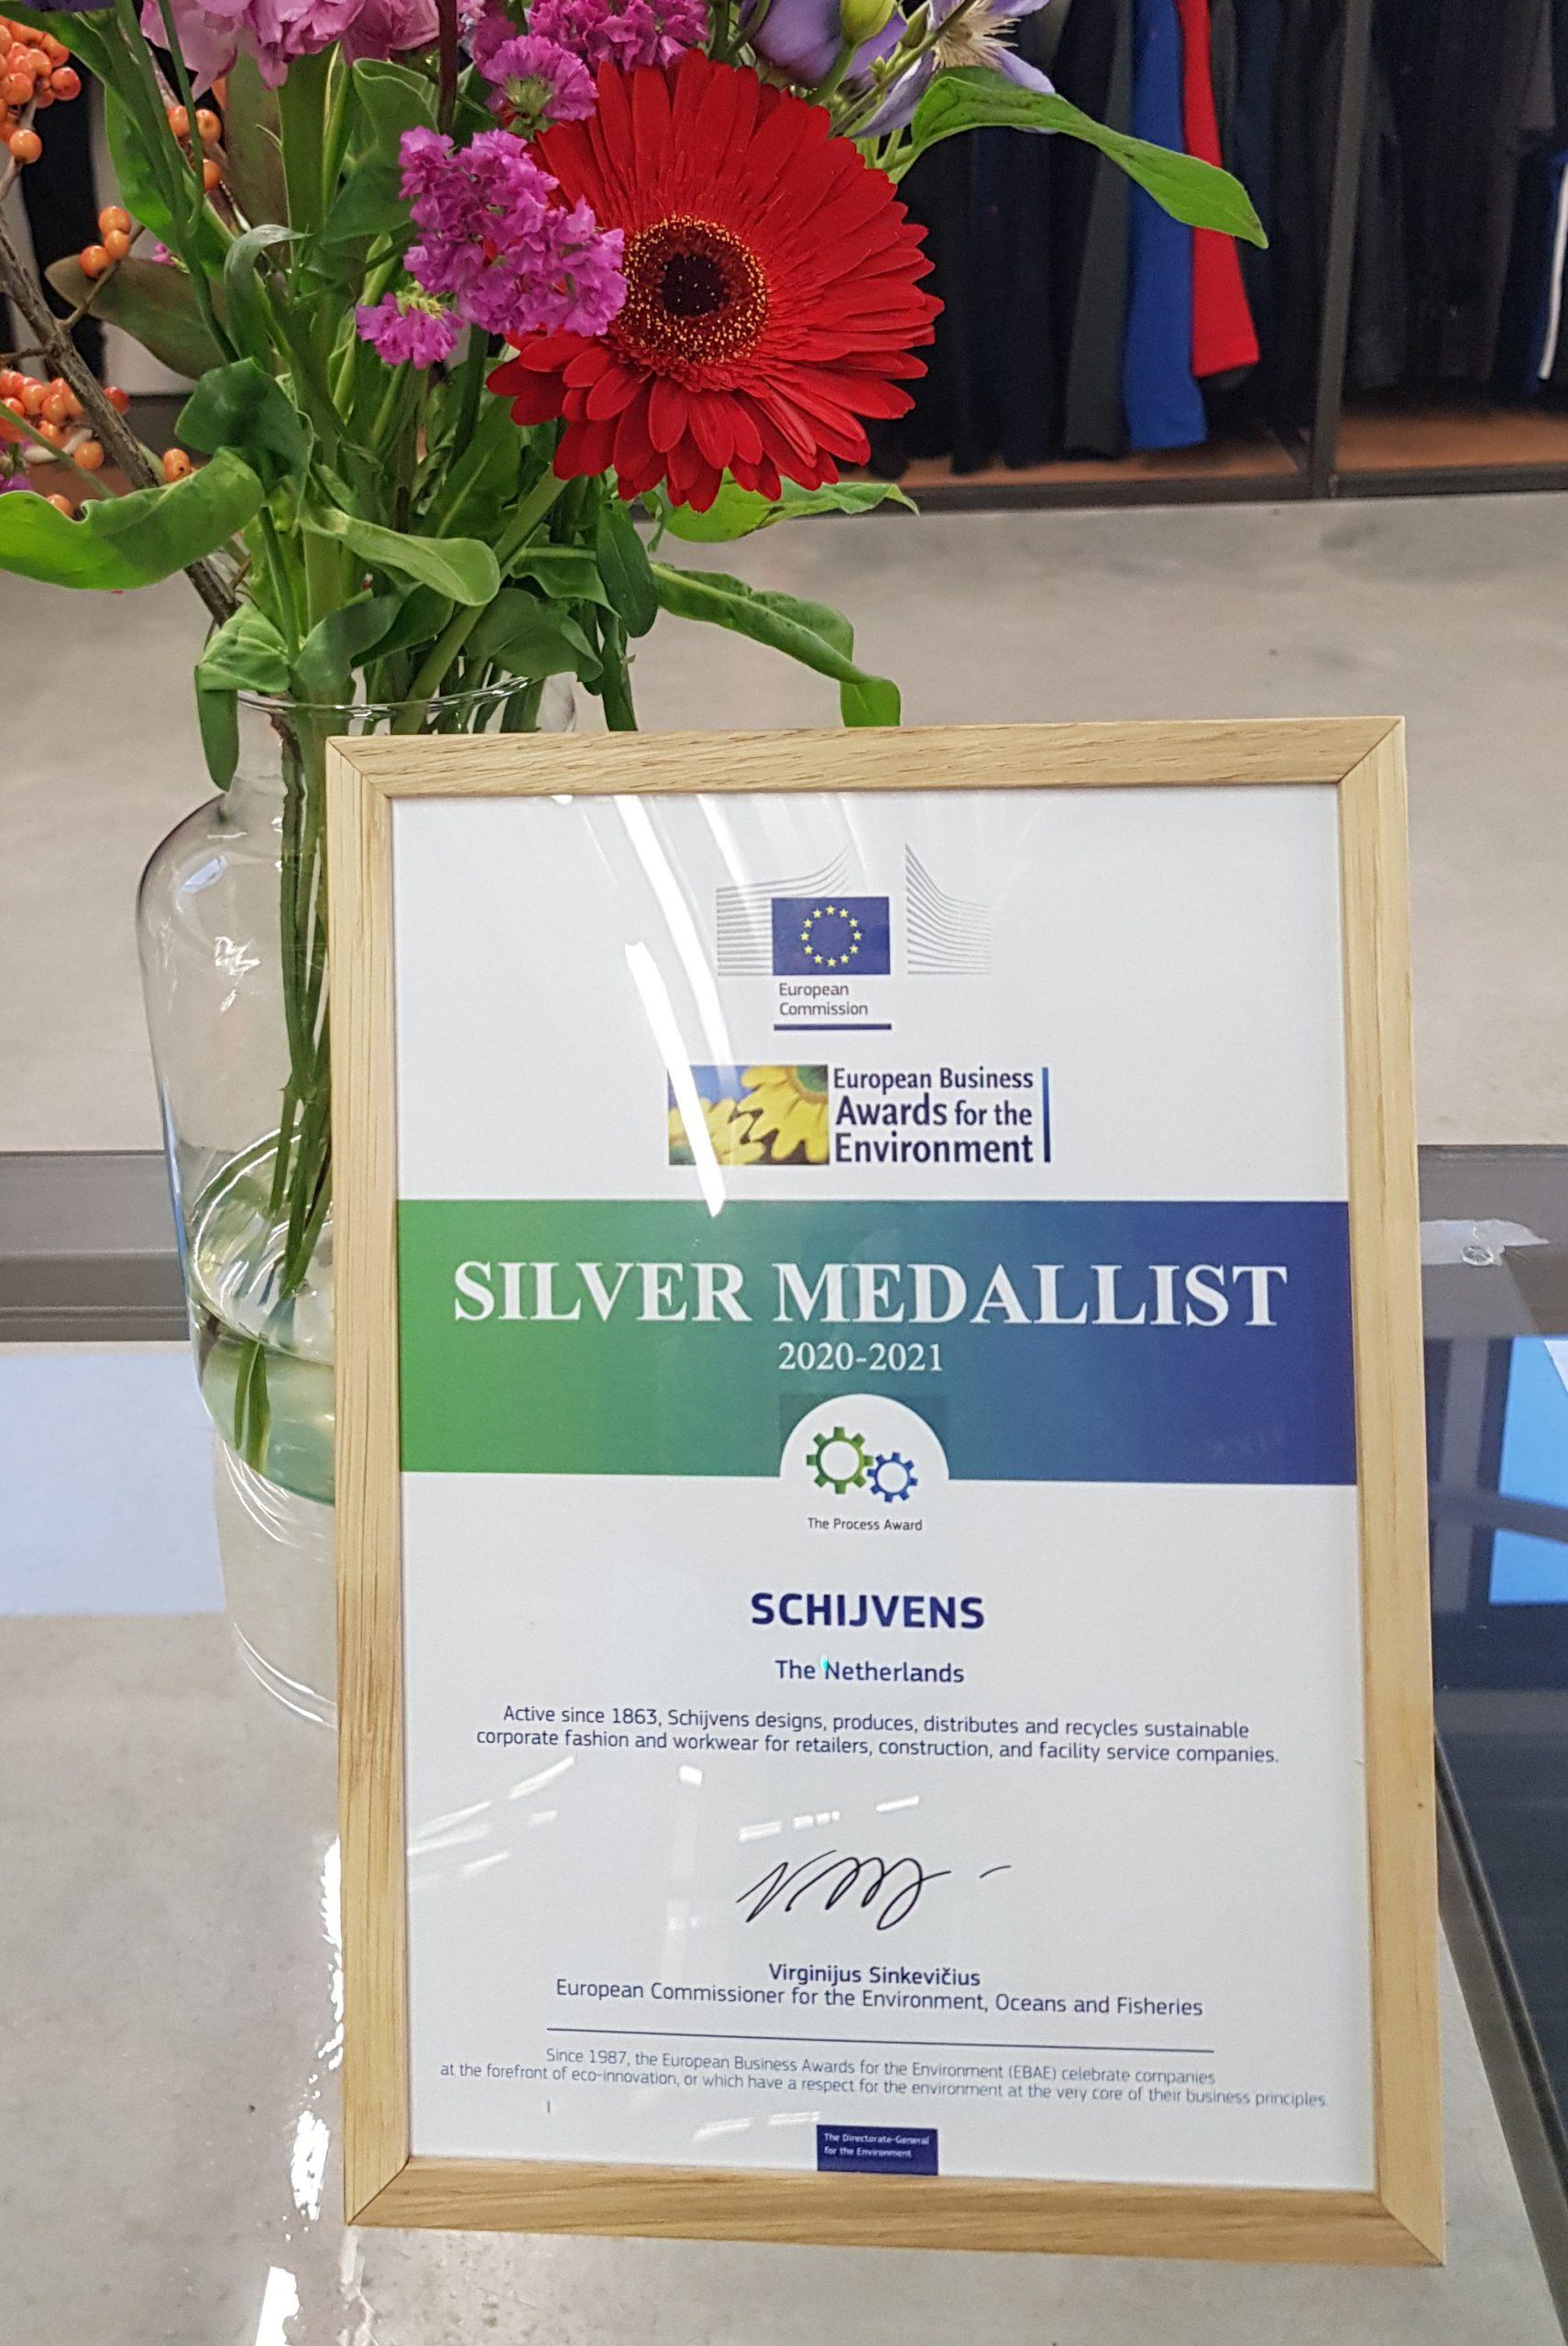 Silver medallist!